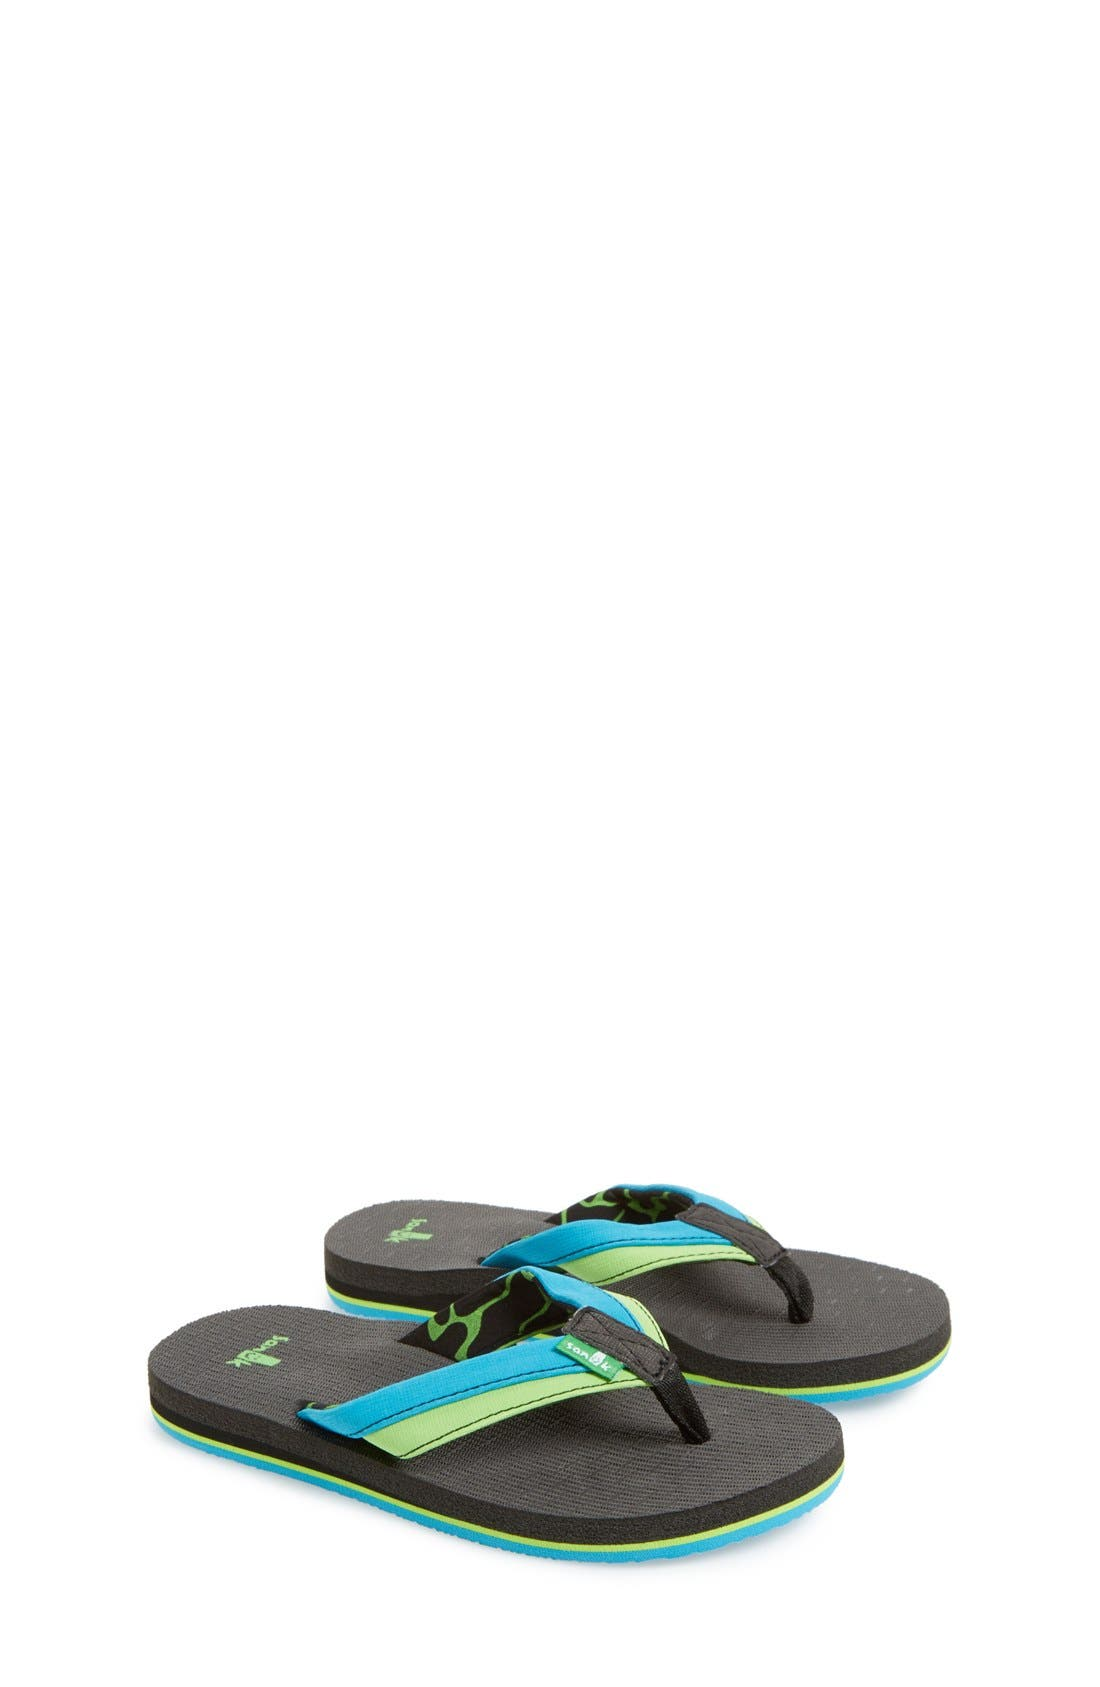 'Rootbeer Cozy' Lightweight Flip Flop Sandal,                             Main thumbnail 3, color,